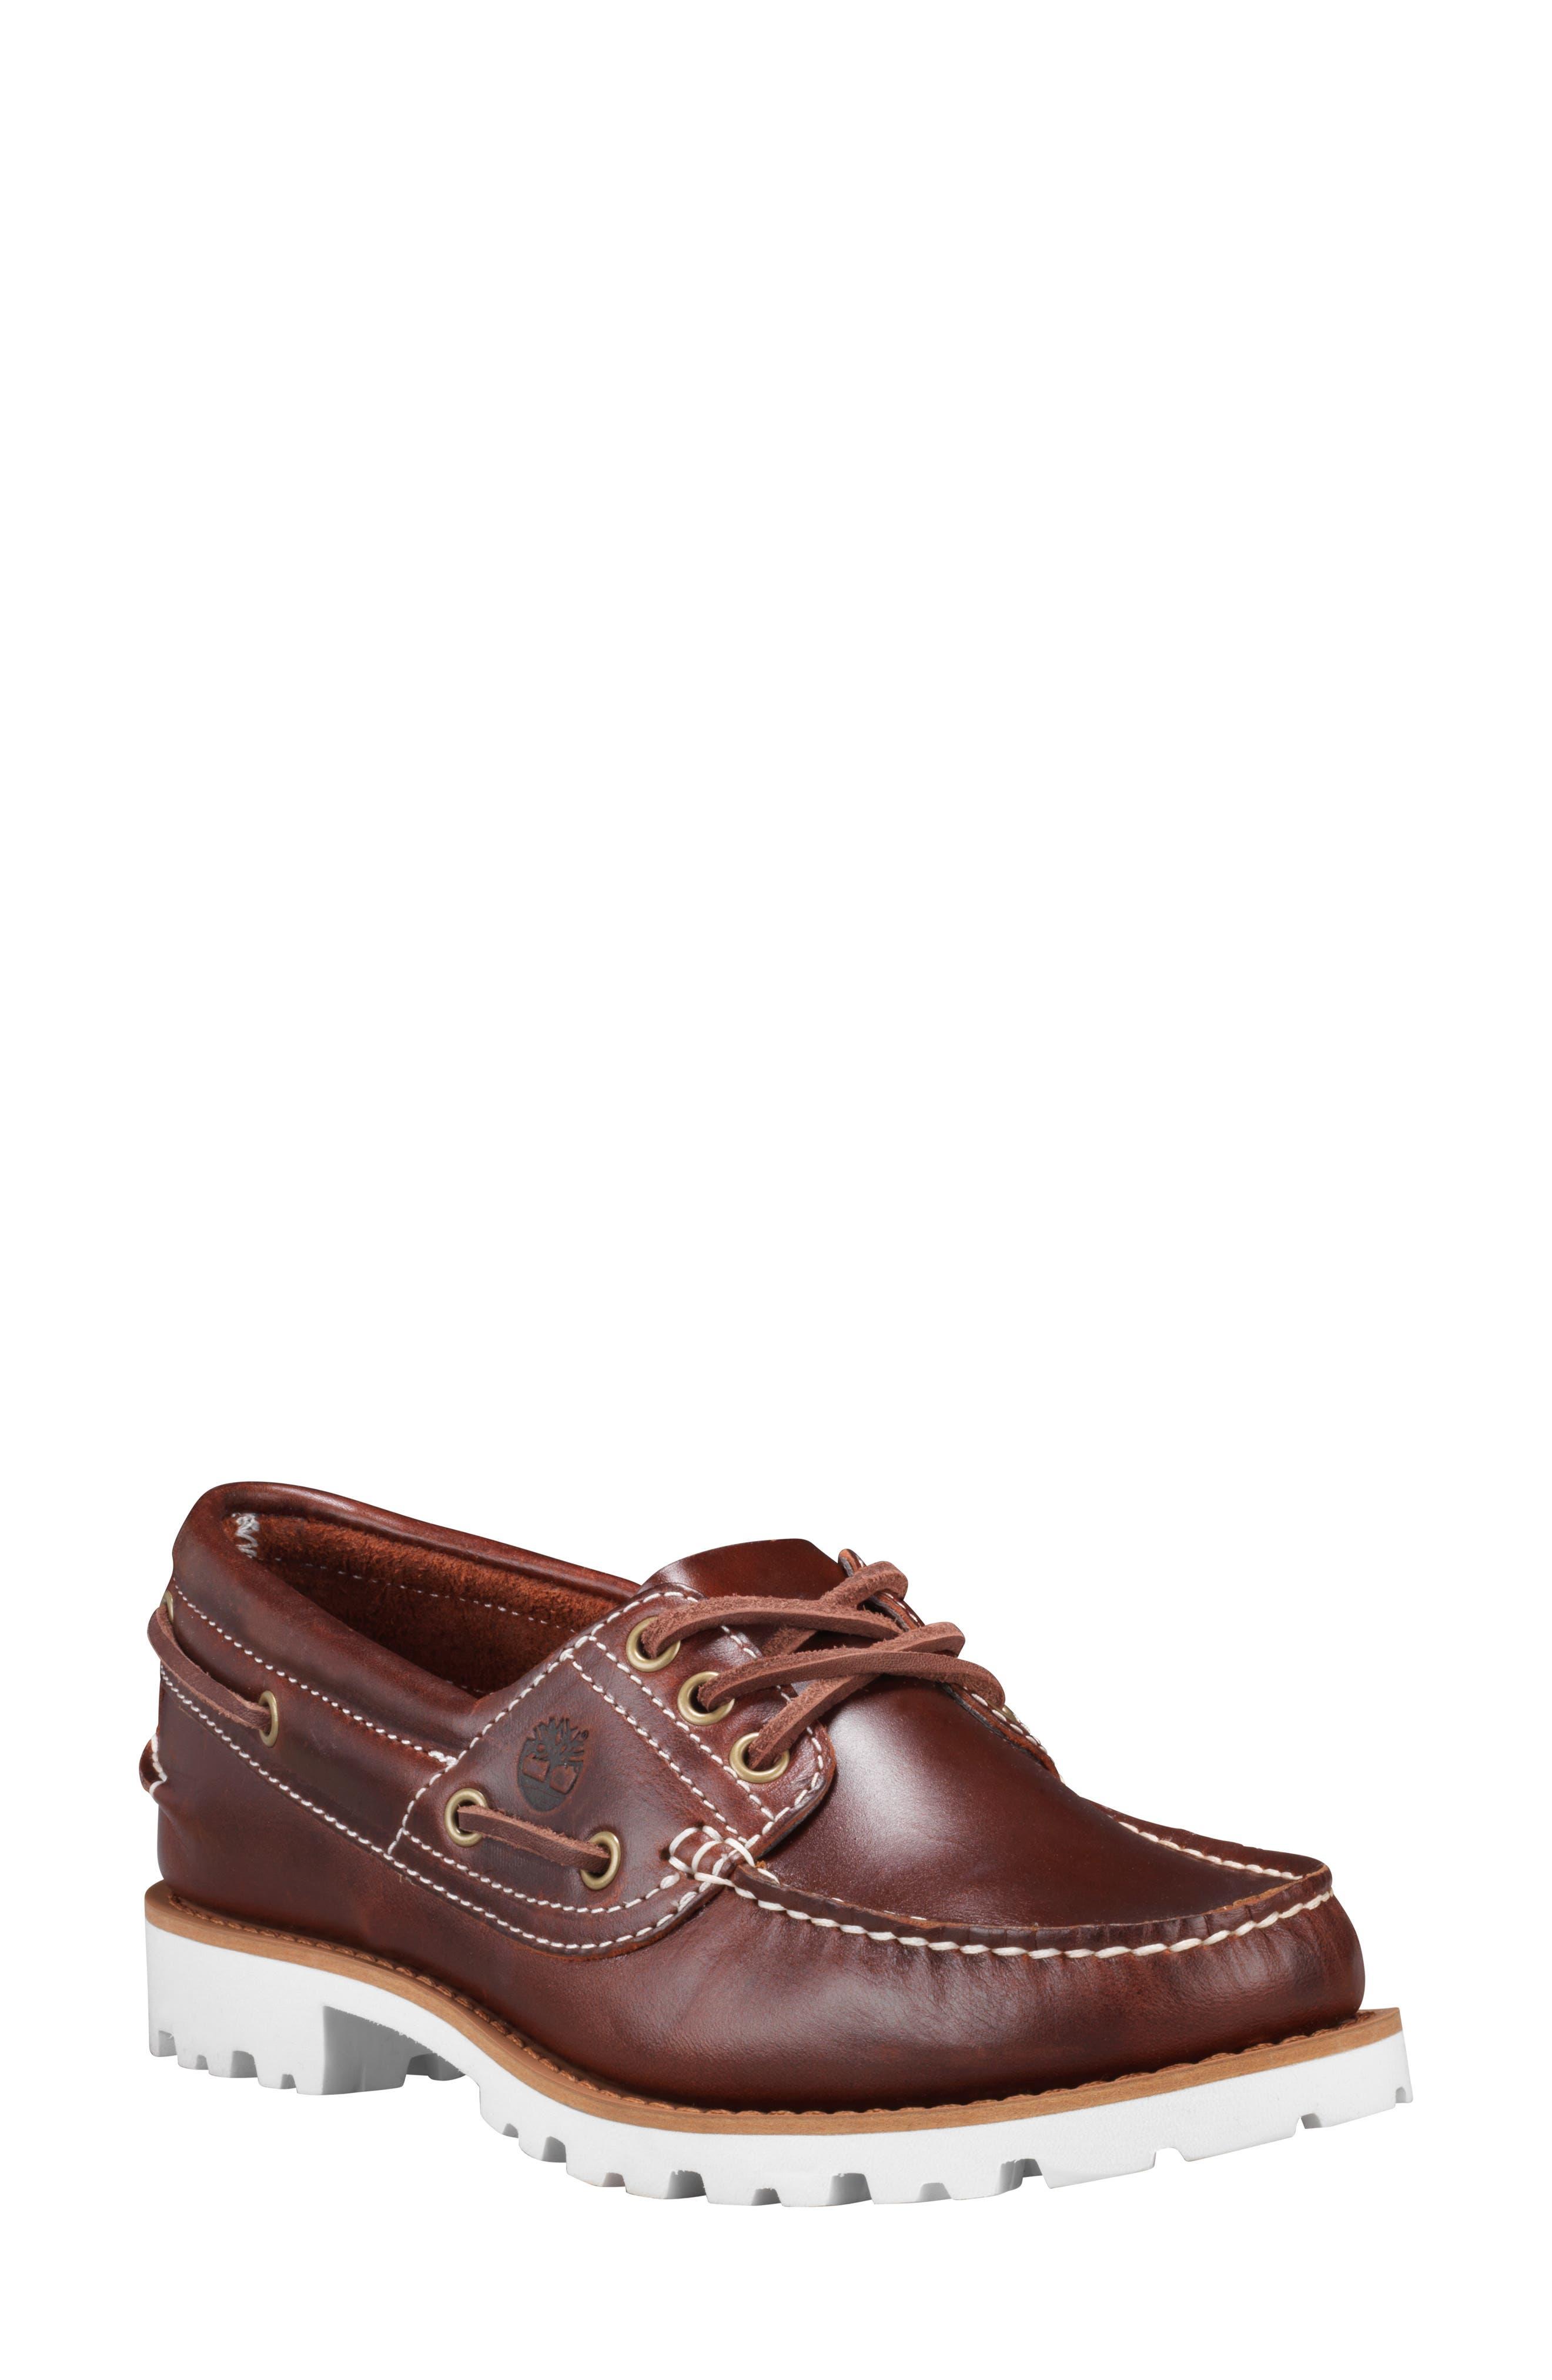 Timberland Noreen Boat Shoe